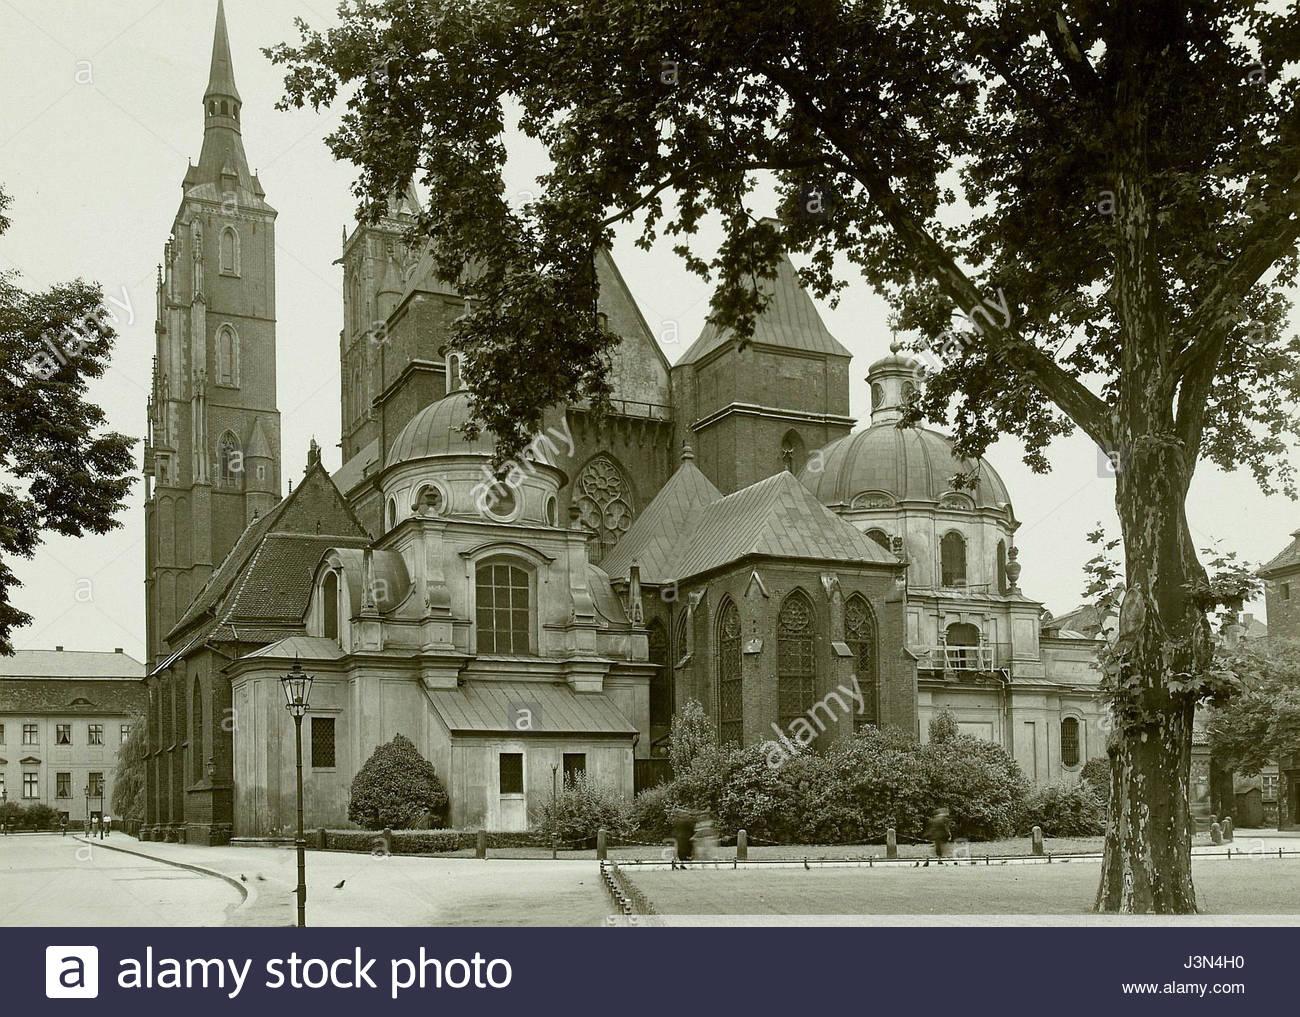 https://c8.alamy.com/comp/J3N4H0/german-city-breslau-wroclaw-on-vintage-postcard-at-the-turn-of-the-J3N4H0.jpg